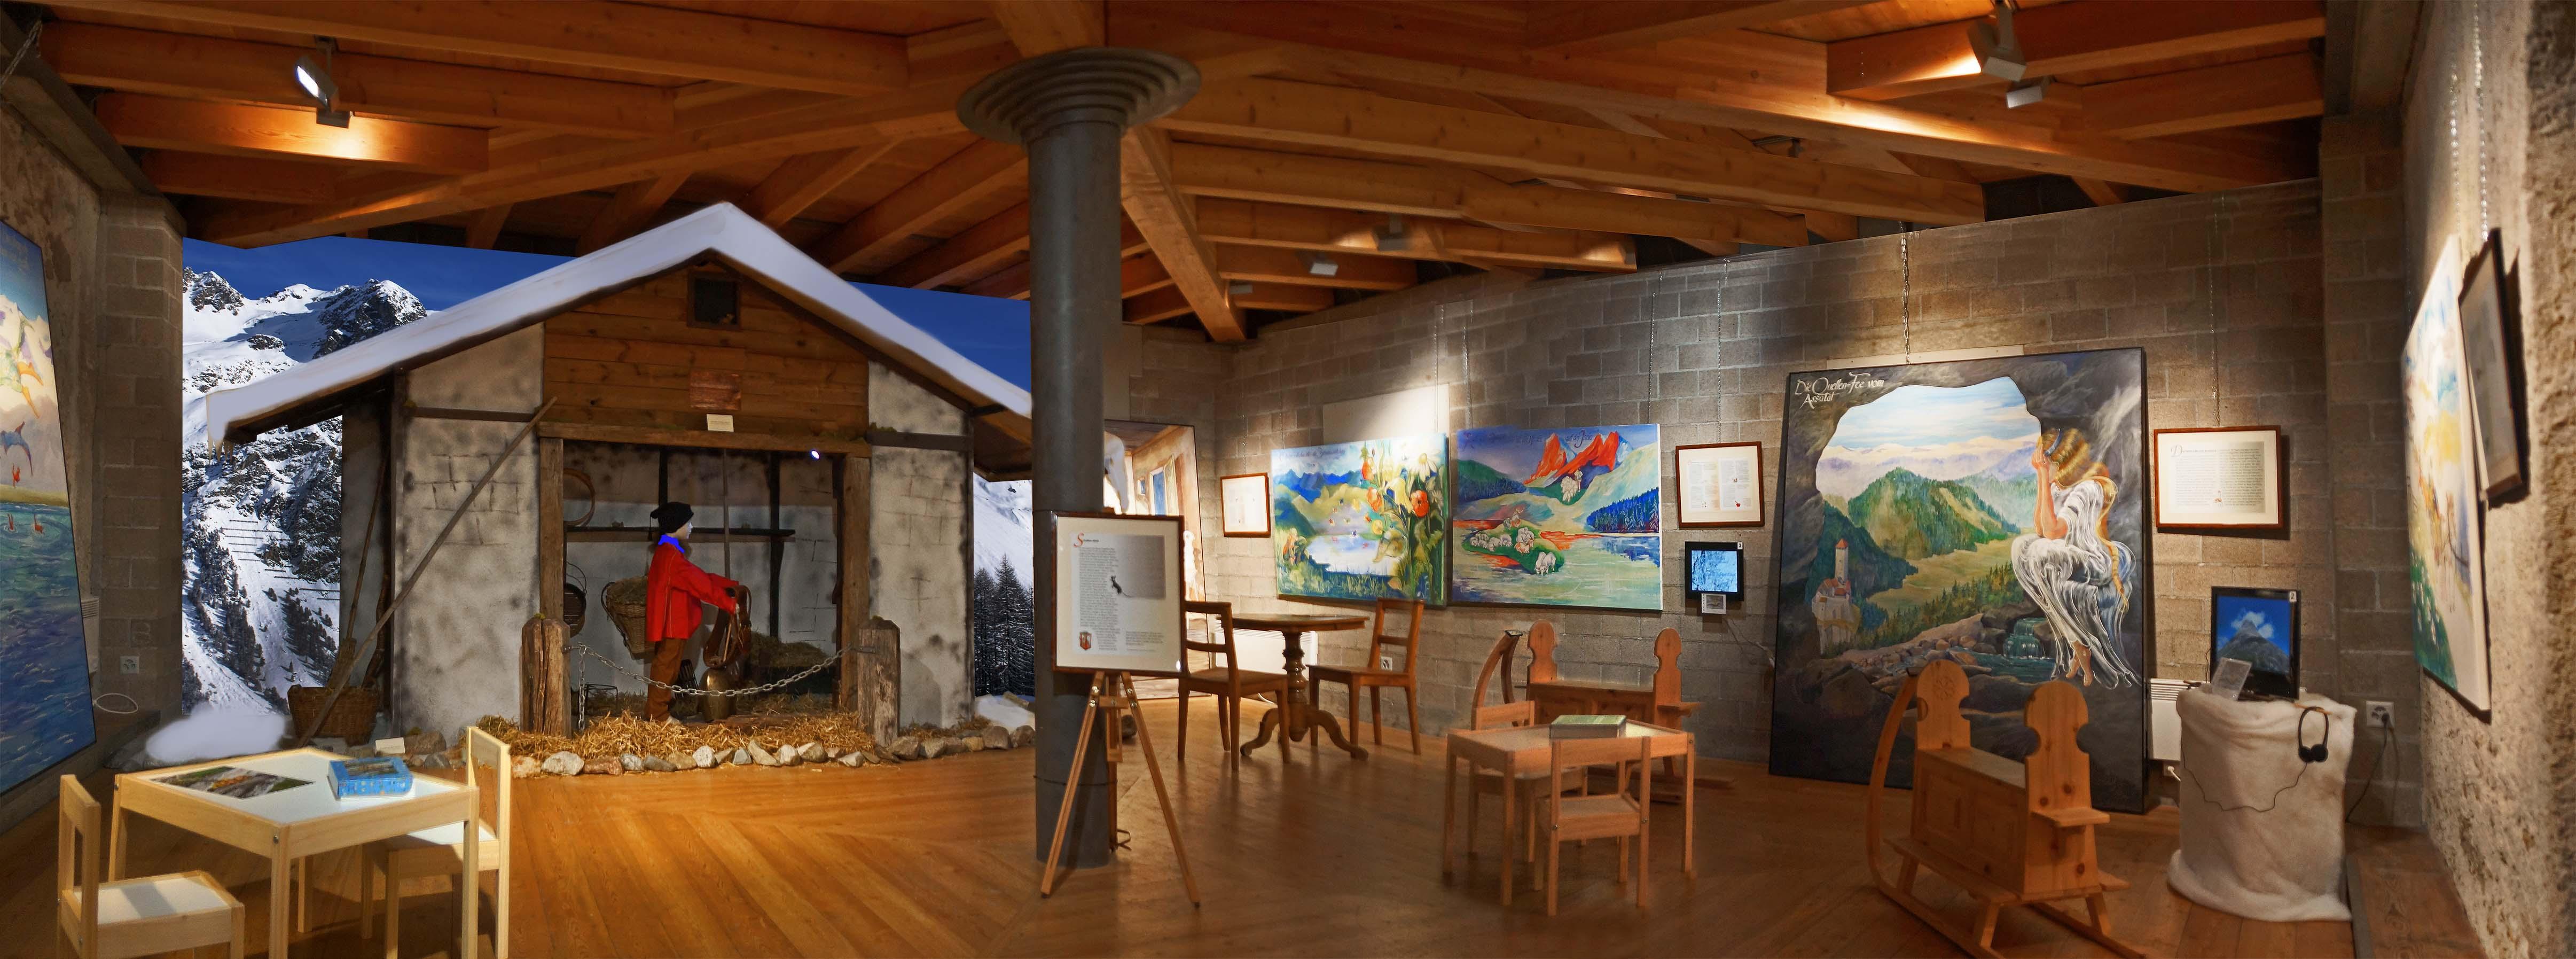 Museum Alpin Slide 6